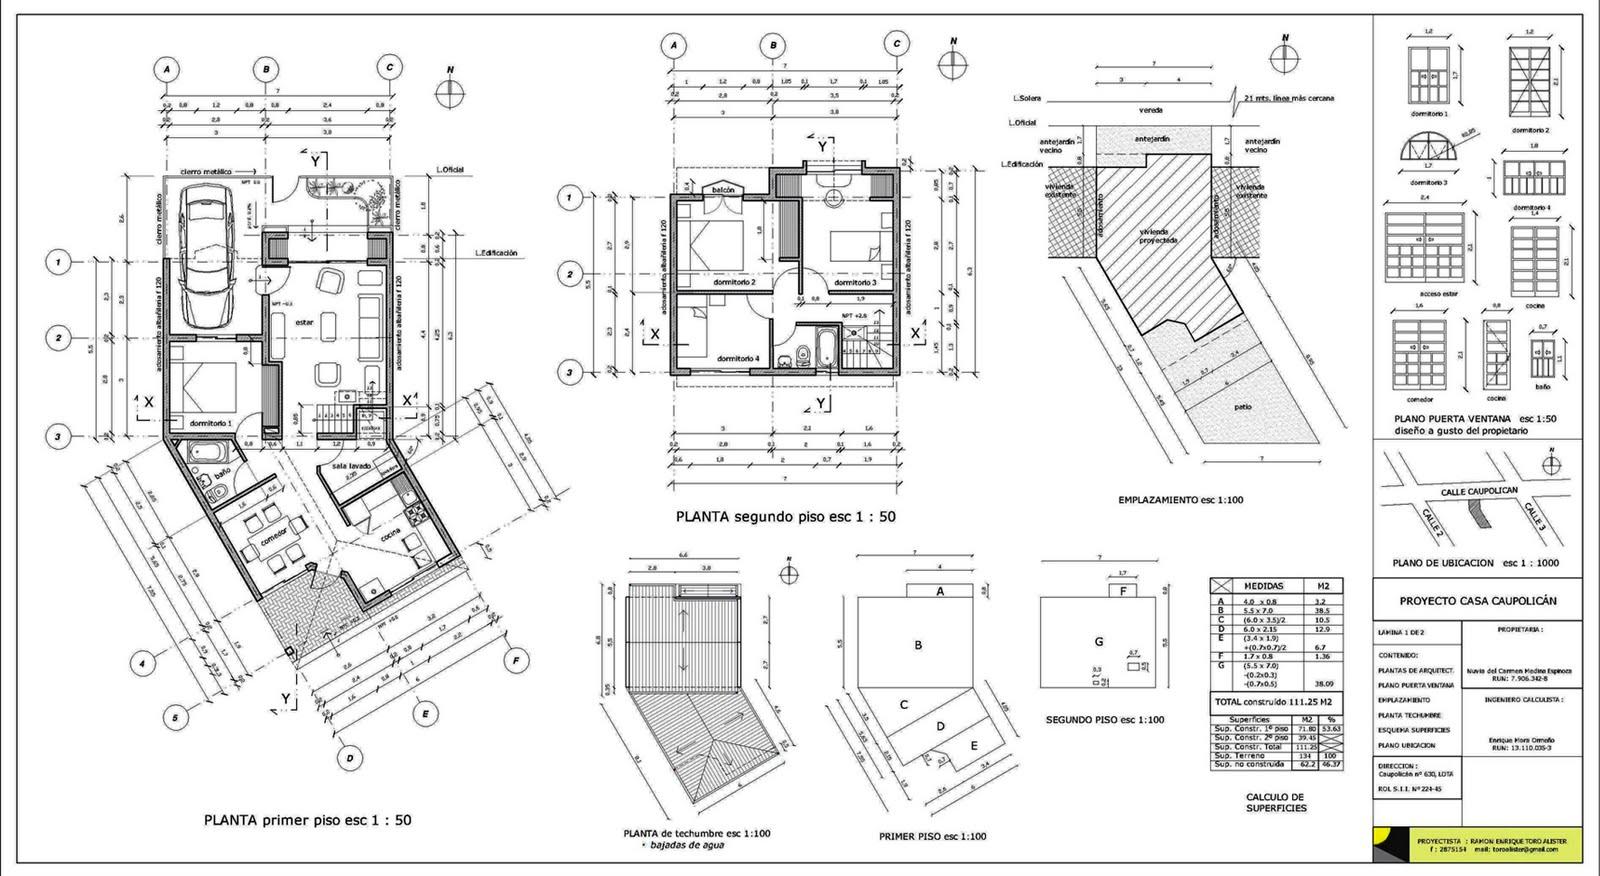 Arquitectura y urbanismo for Que es una planta arquitectonica